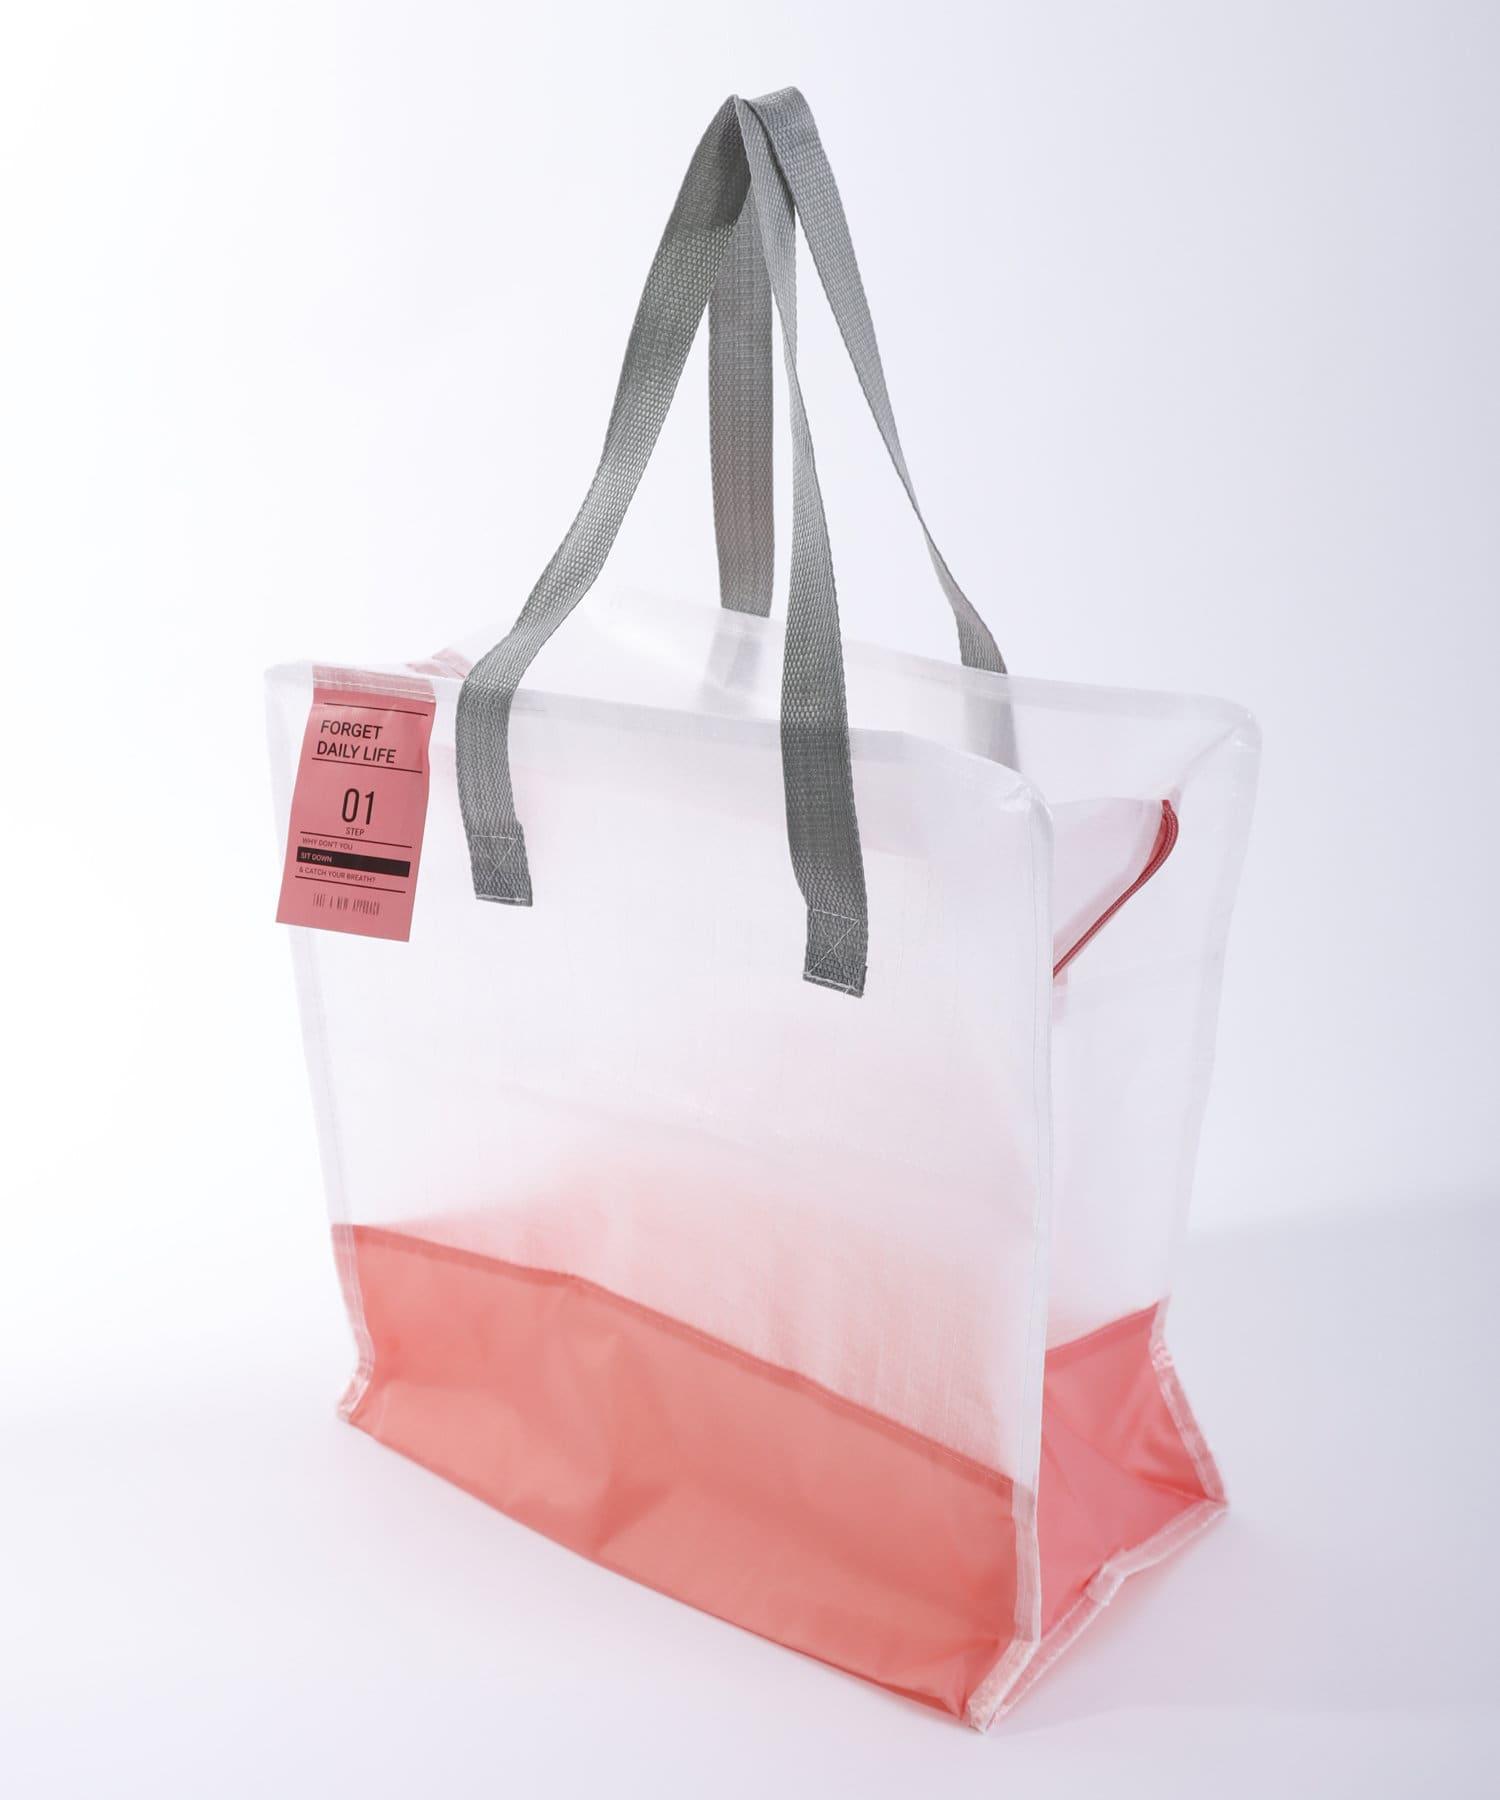 3COINS(スリーコインズ) ライフスタイル 【GIRLY PICNIC】レジャーバッグ【Mサイズ】 ピンク